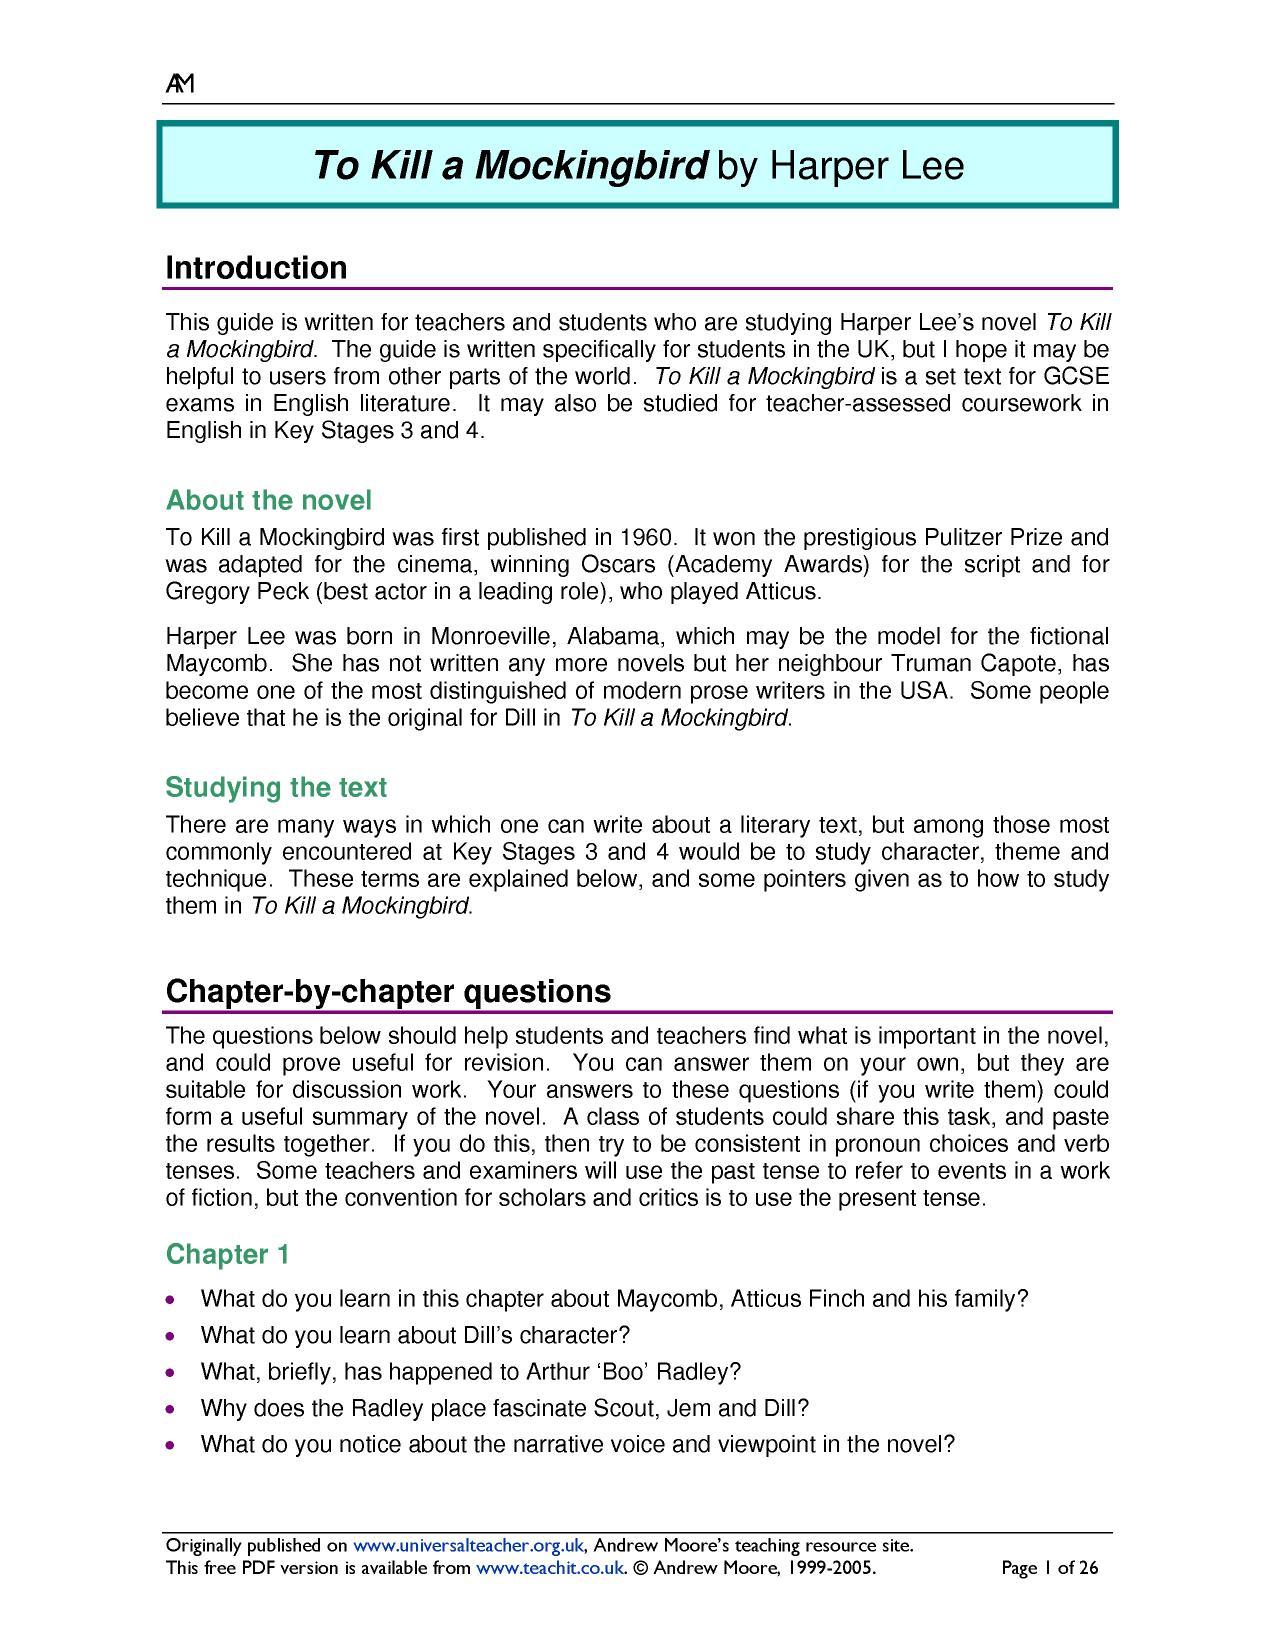 worksheet. To Kill A Mockingbird Worksheet Answers